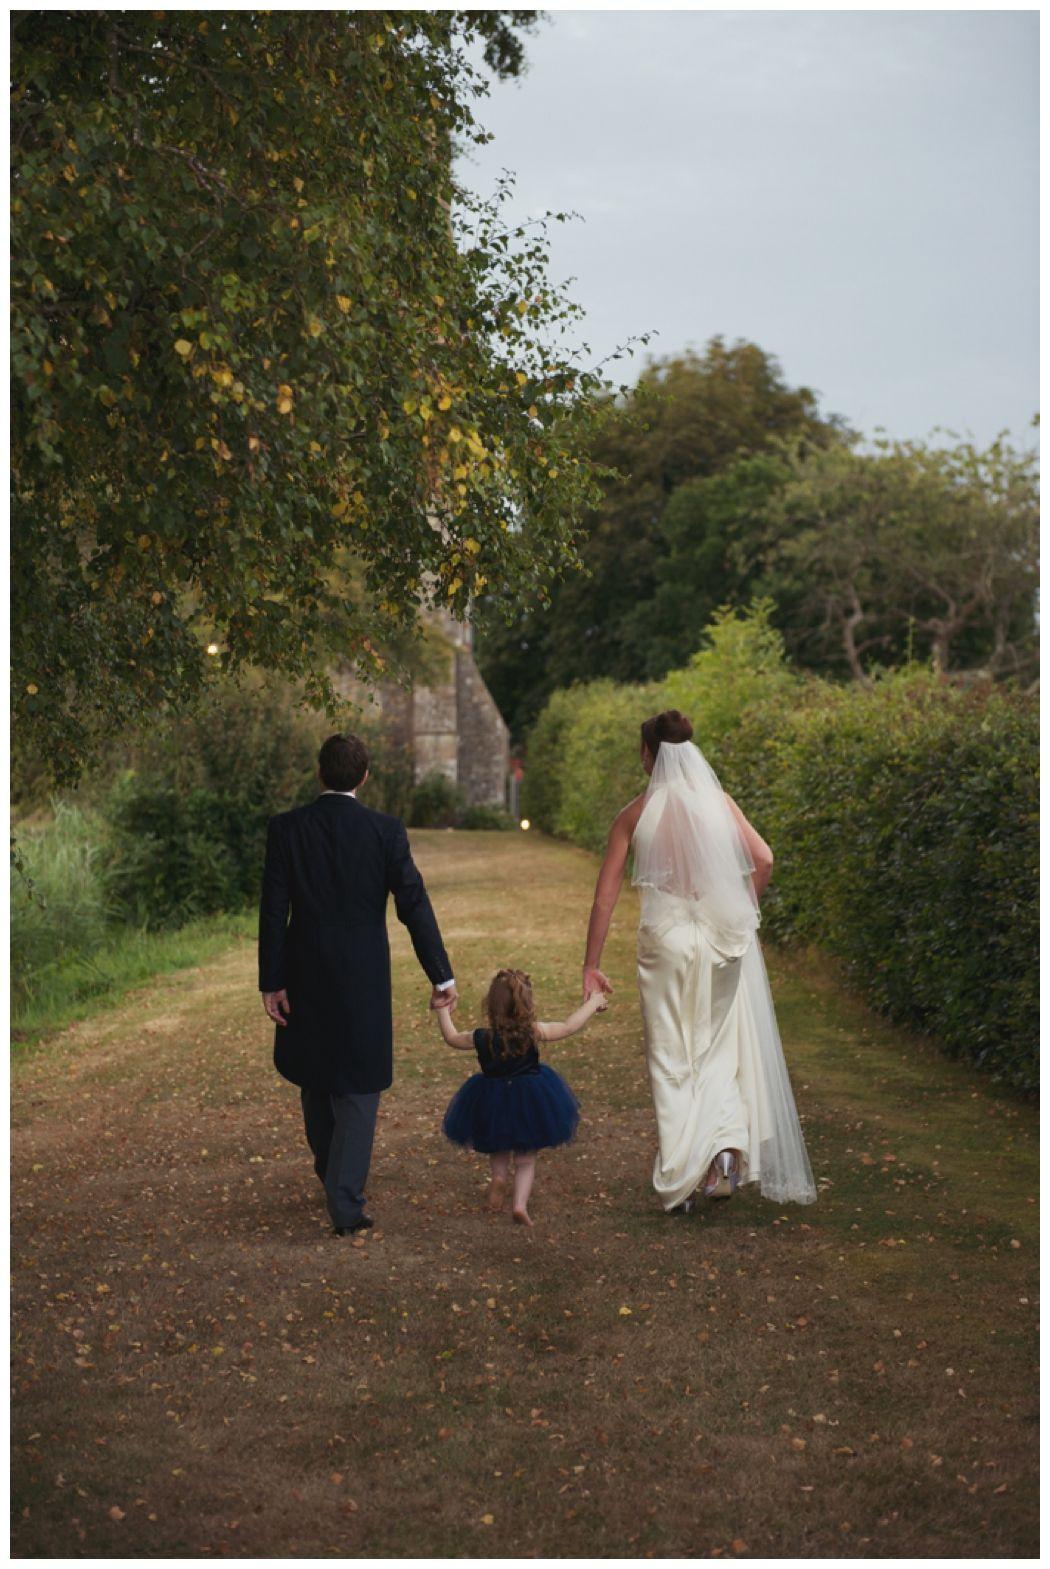 Stephanie And Kieran S Wedding At St Augustine S Priory Kent Wedding Photographer Wedding Photo Inspiration Vintage Wedding Photography